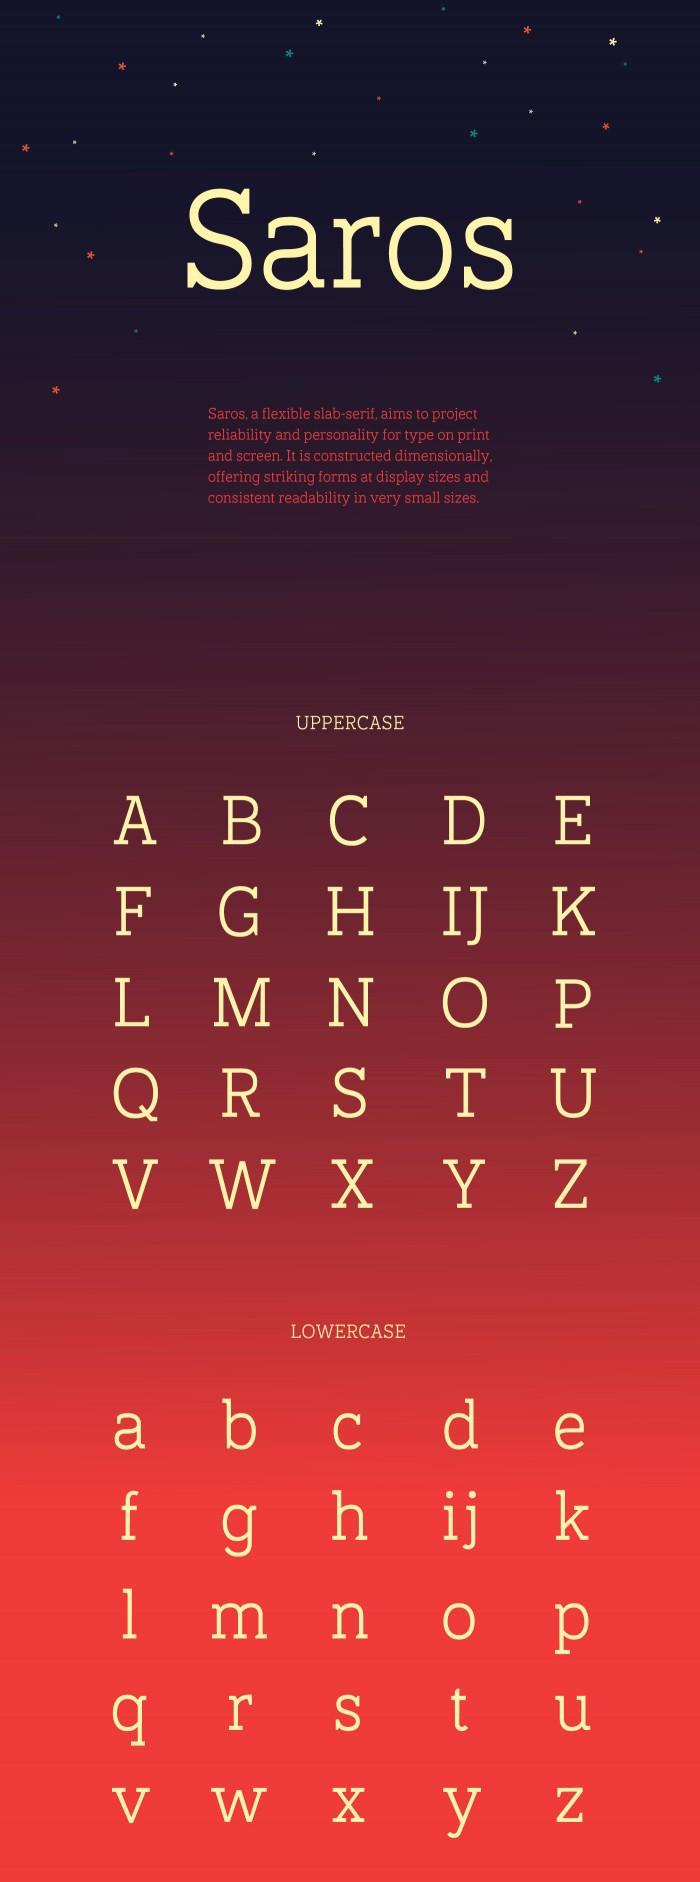 Saros – Free Slab Serif Font Poster A